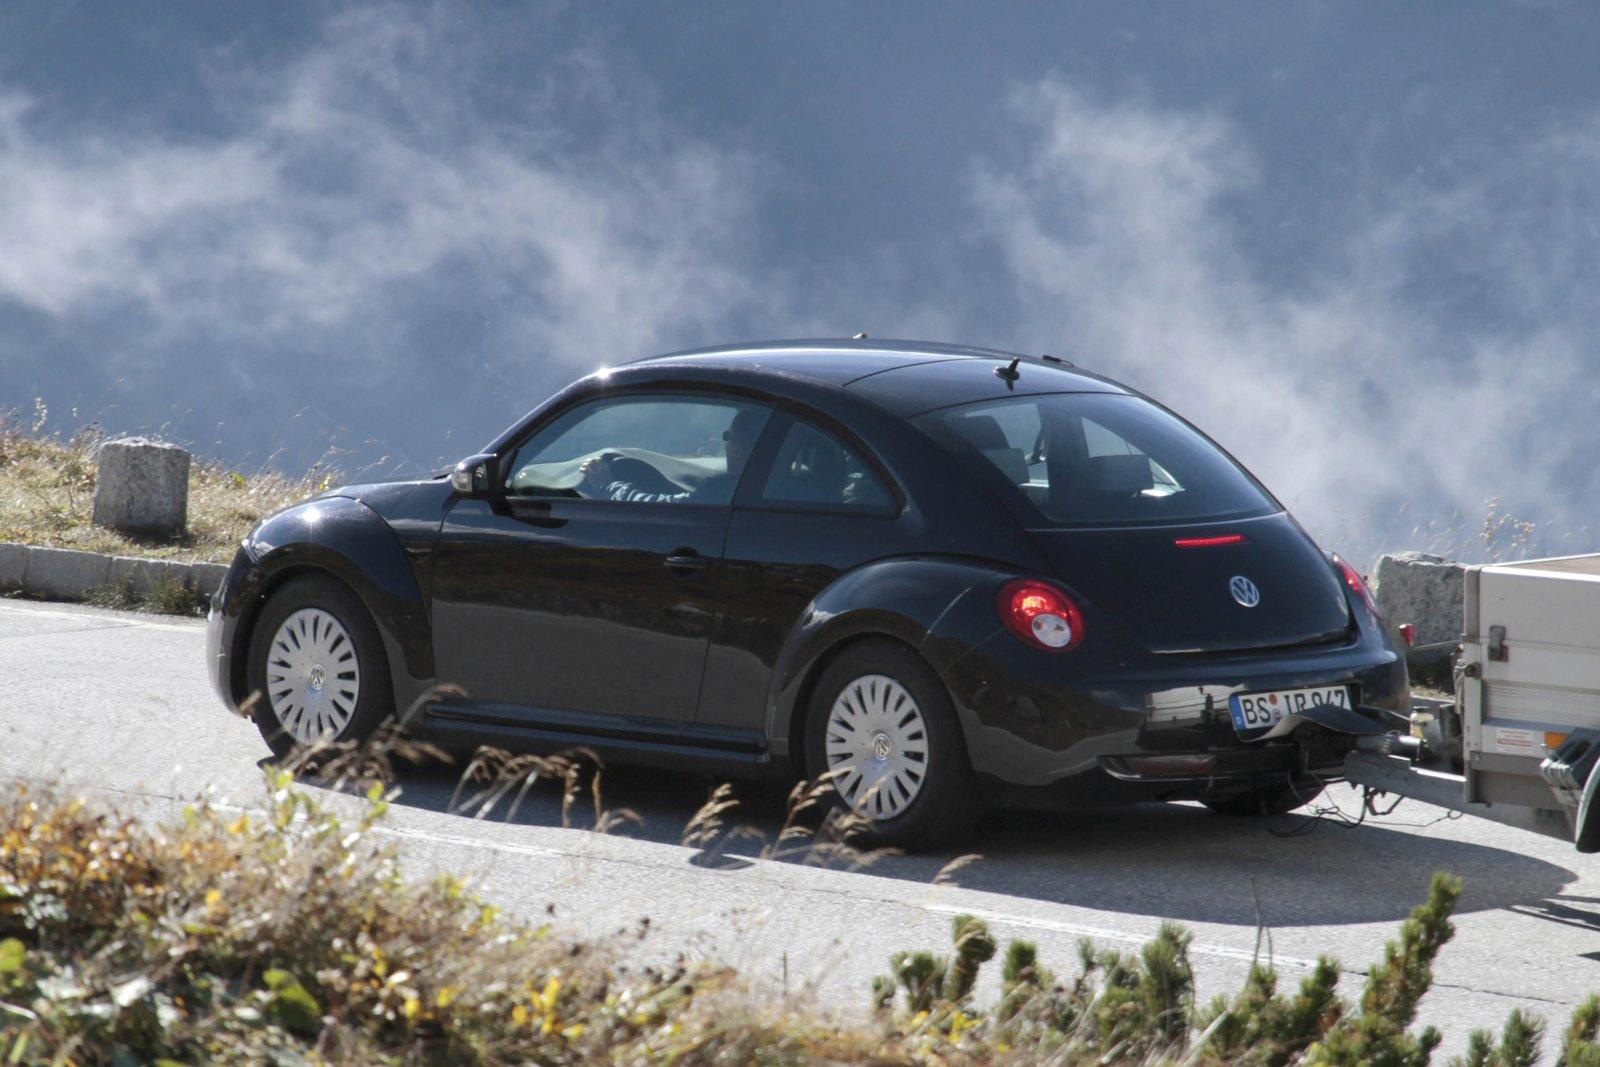 Oprah Winfrey Gives Away 2012 Volkswagen Beetle to Audience